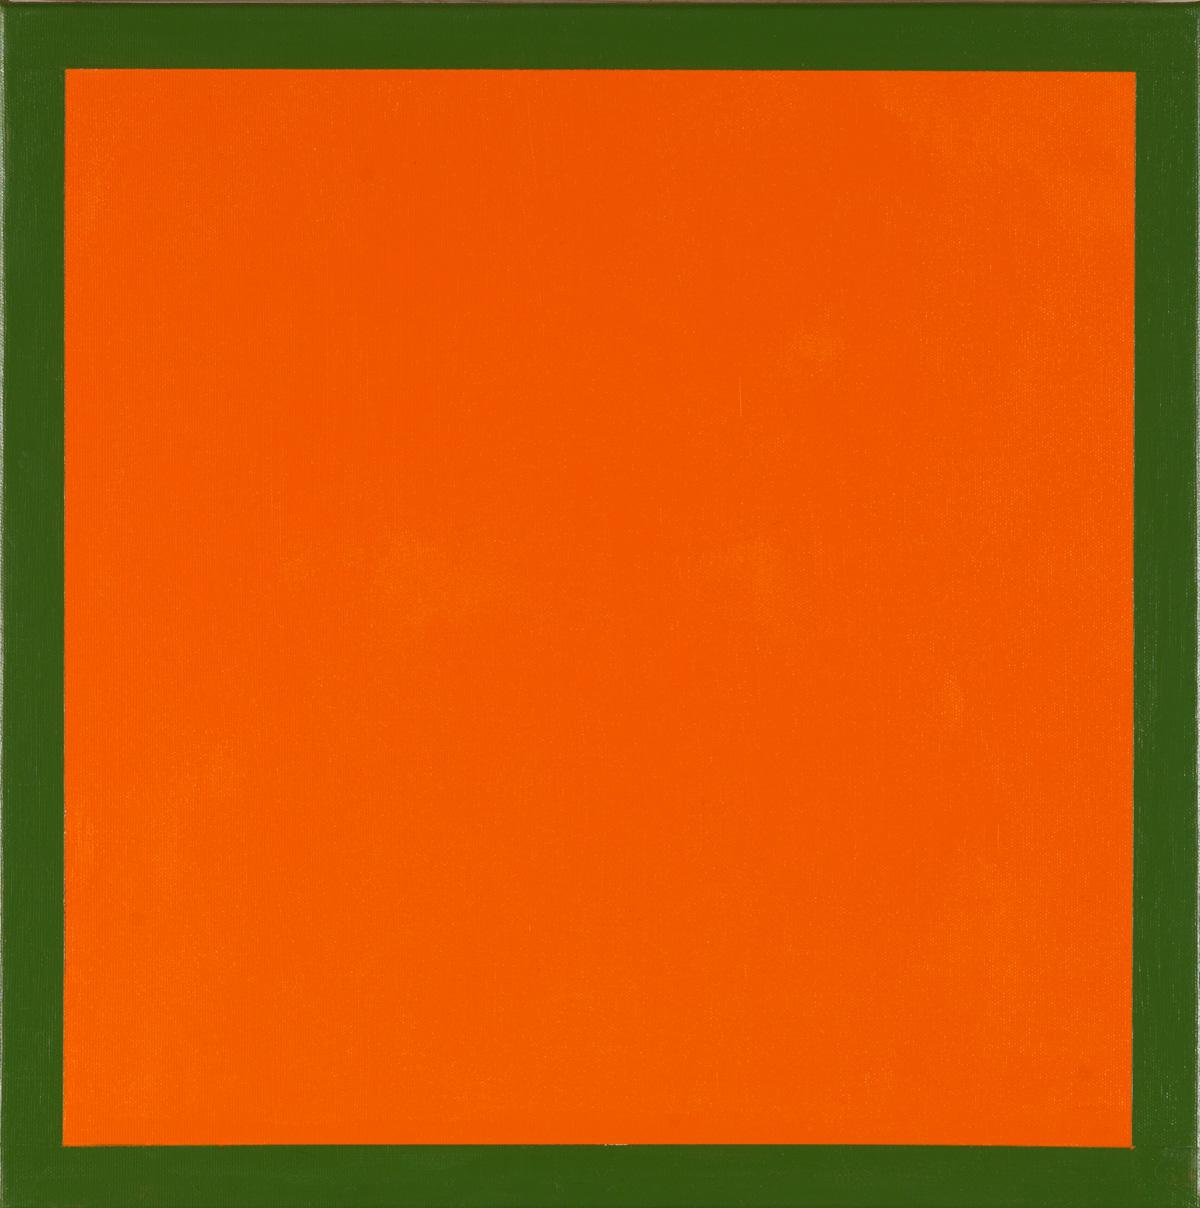 best art online, aesthetic, minimalist painting, simple, stylish, lines, orange, purple, graphic, design